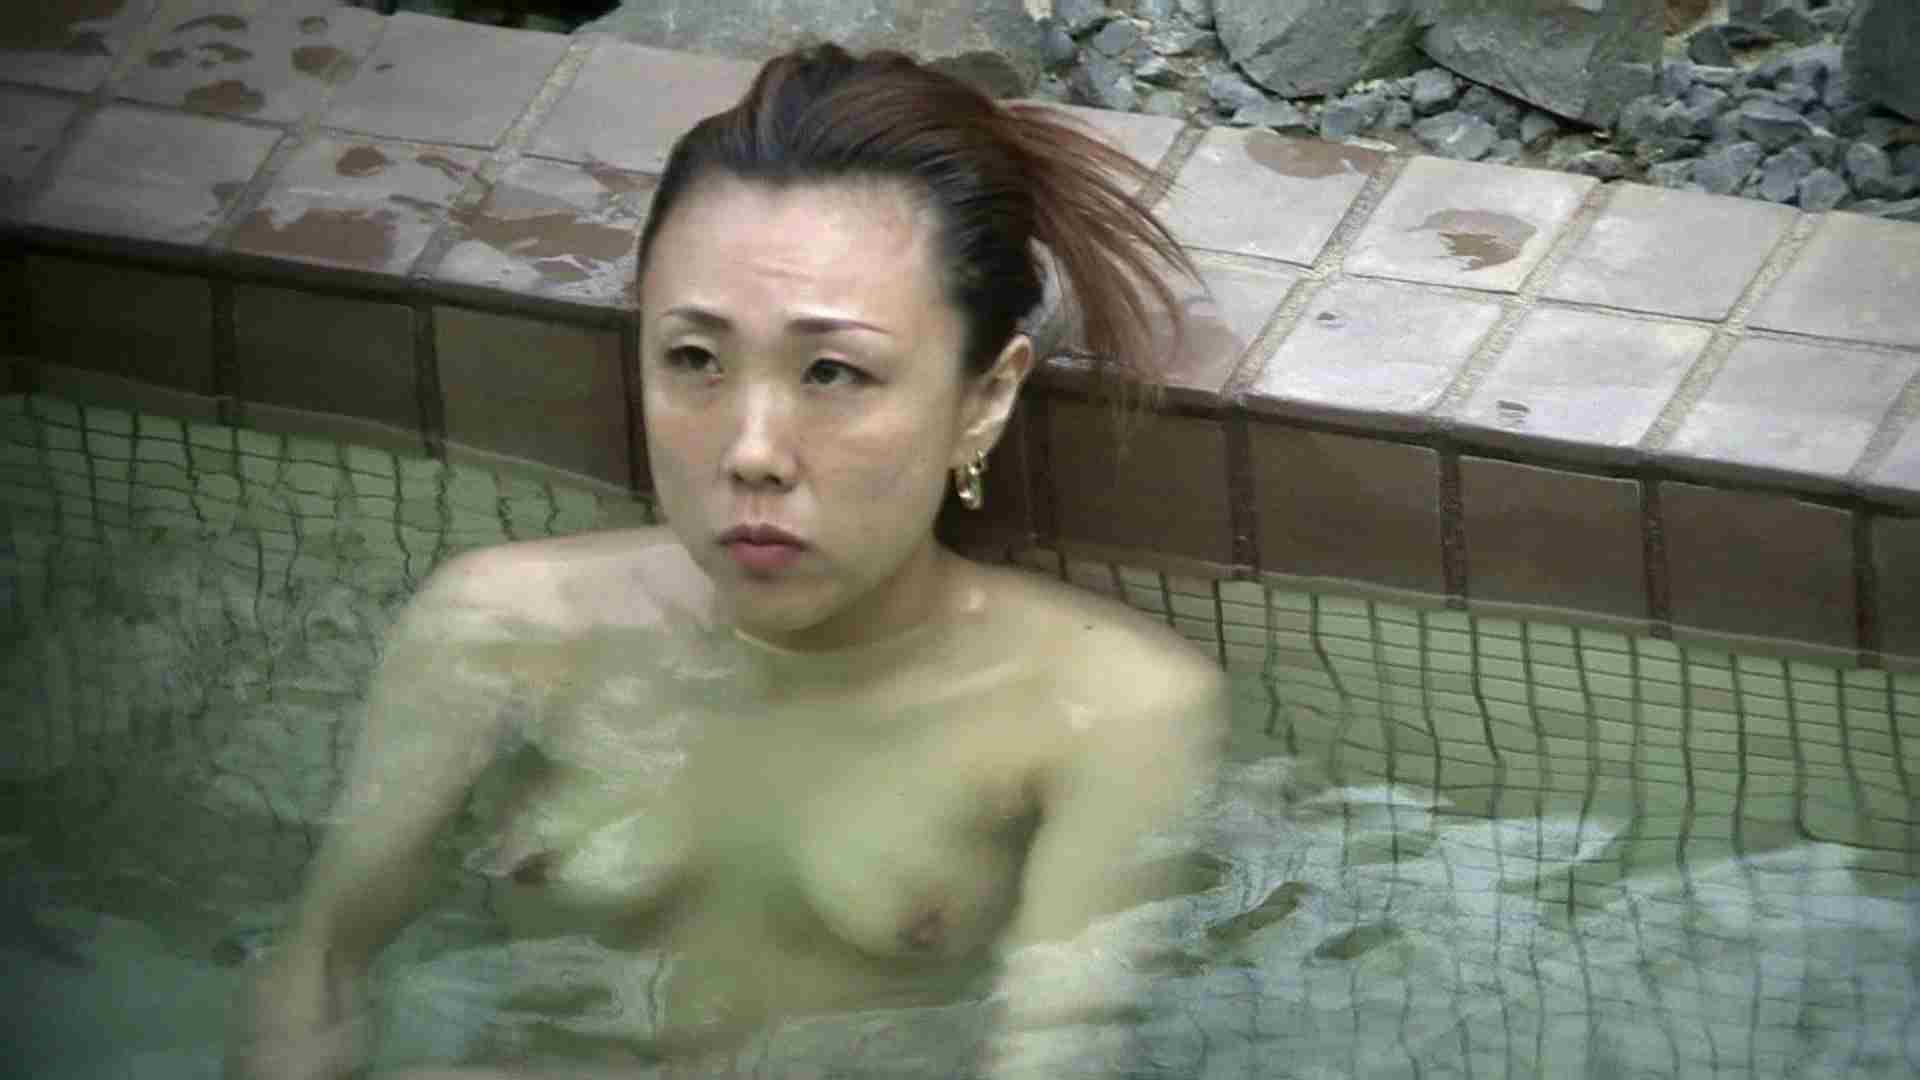 Aquaな露天風呂Vol.654 OLすけべ画像   盗撮  38連発 19